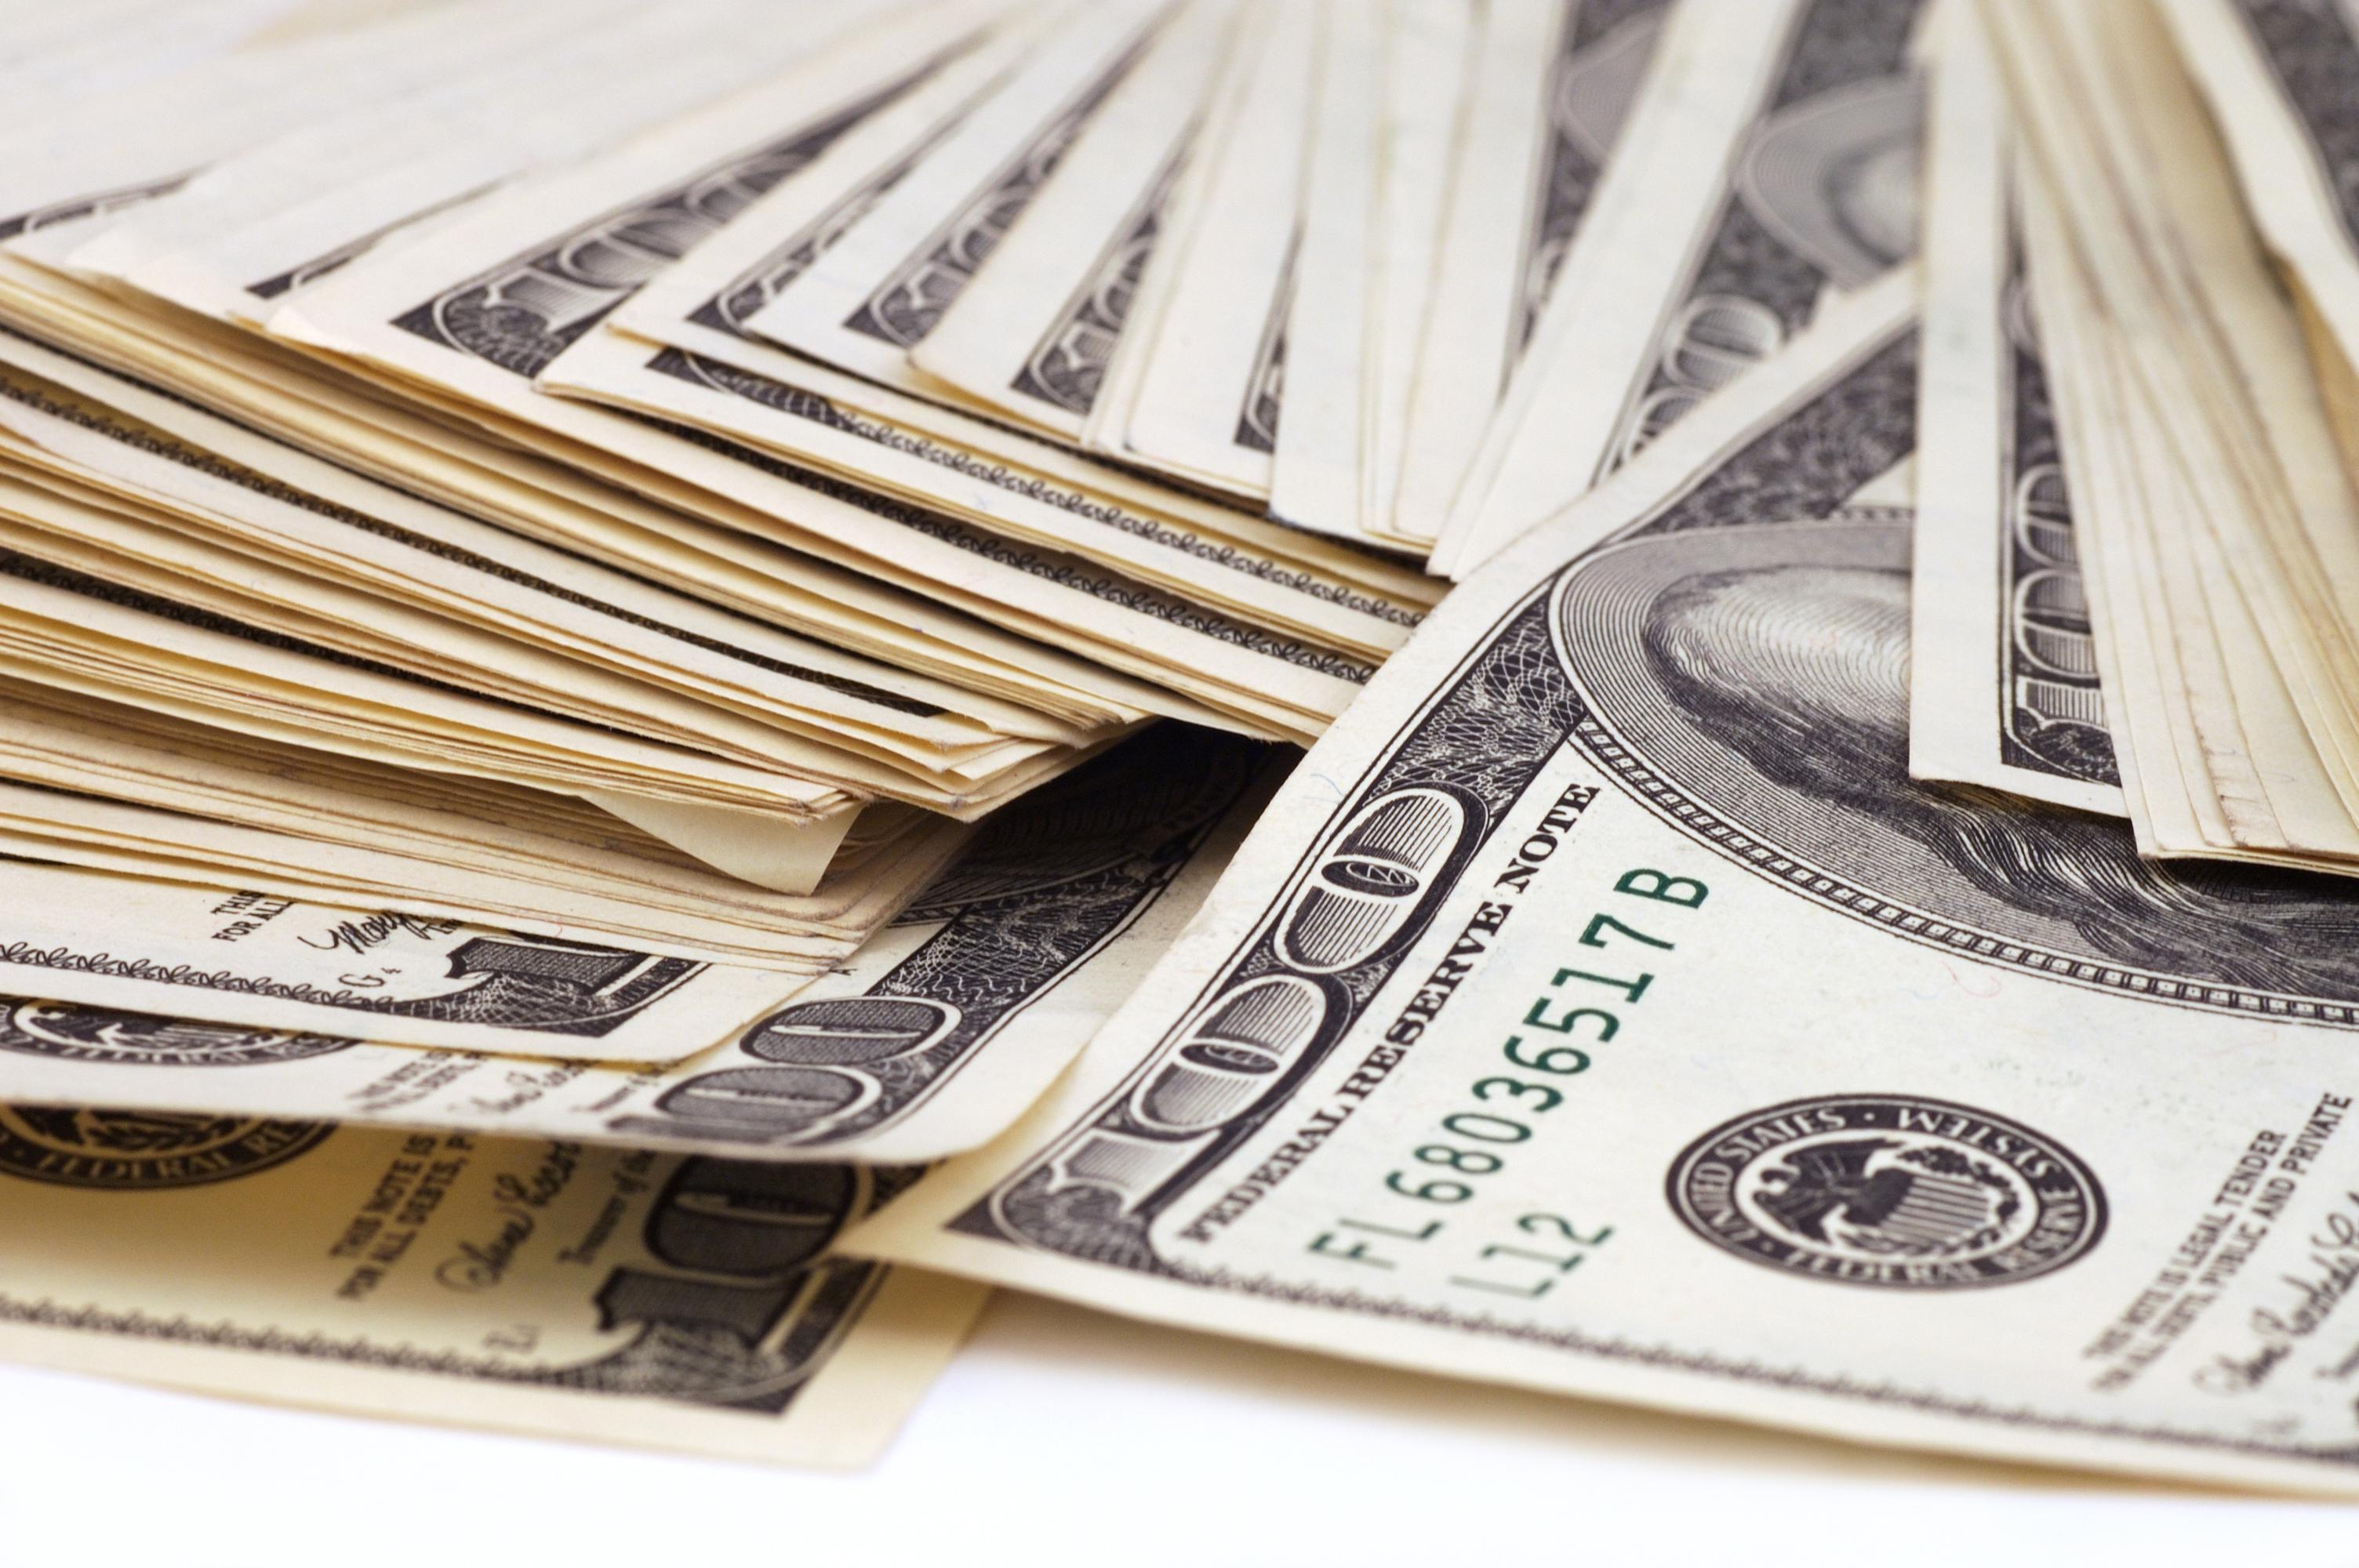 Messy stack of hundred-dollar bills.